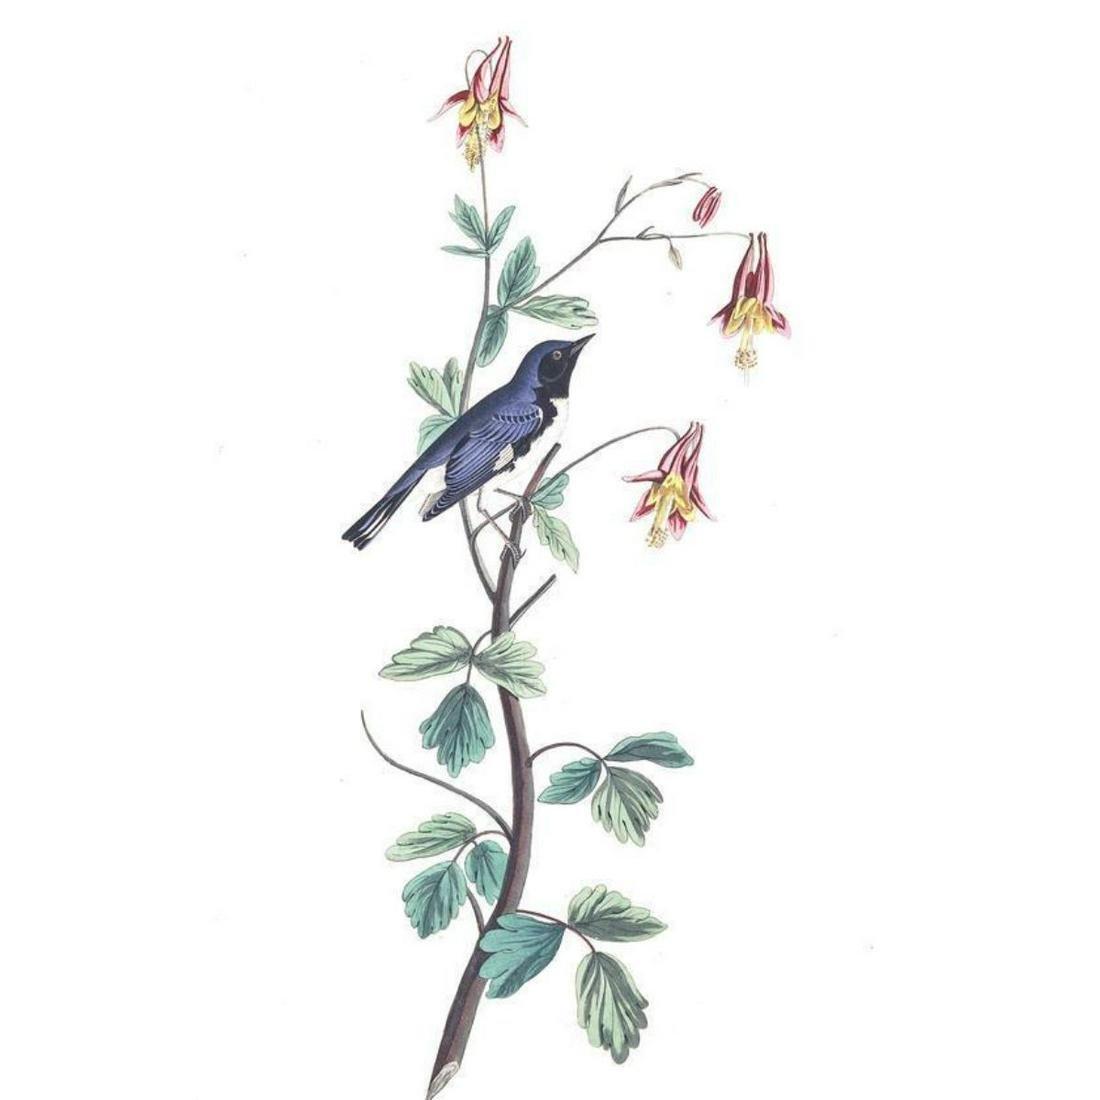 c1946 Audubon Print #155 Black-Throated Blue Warbler